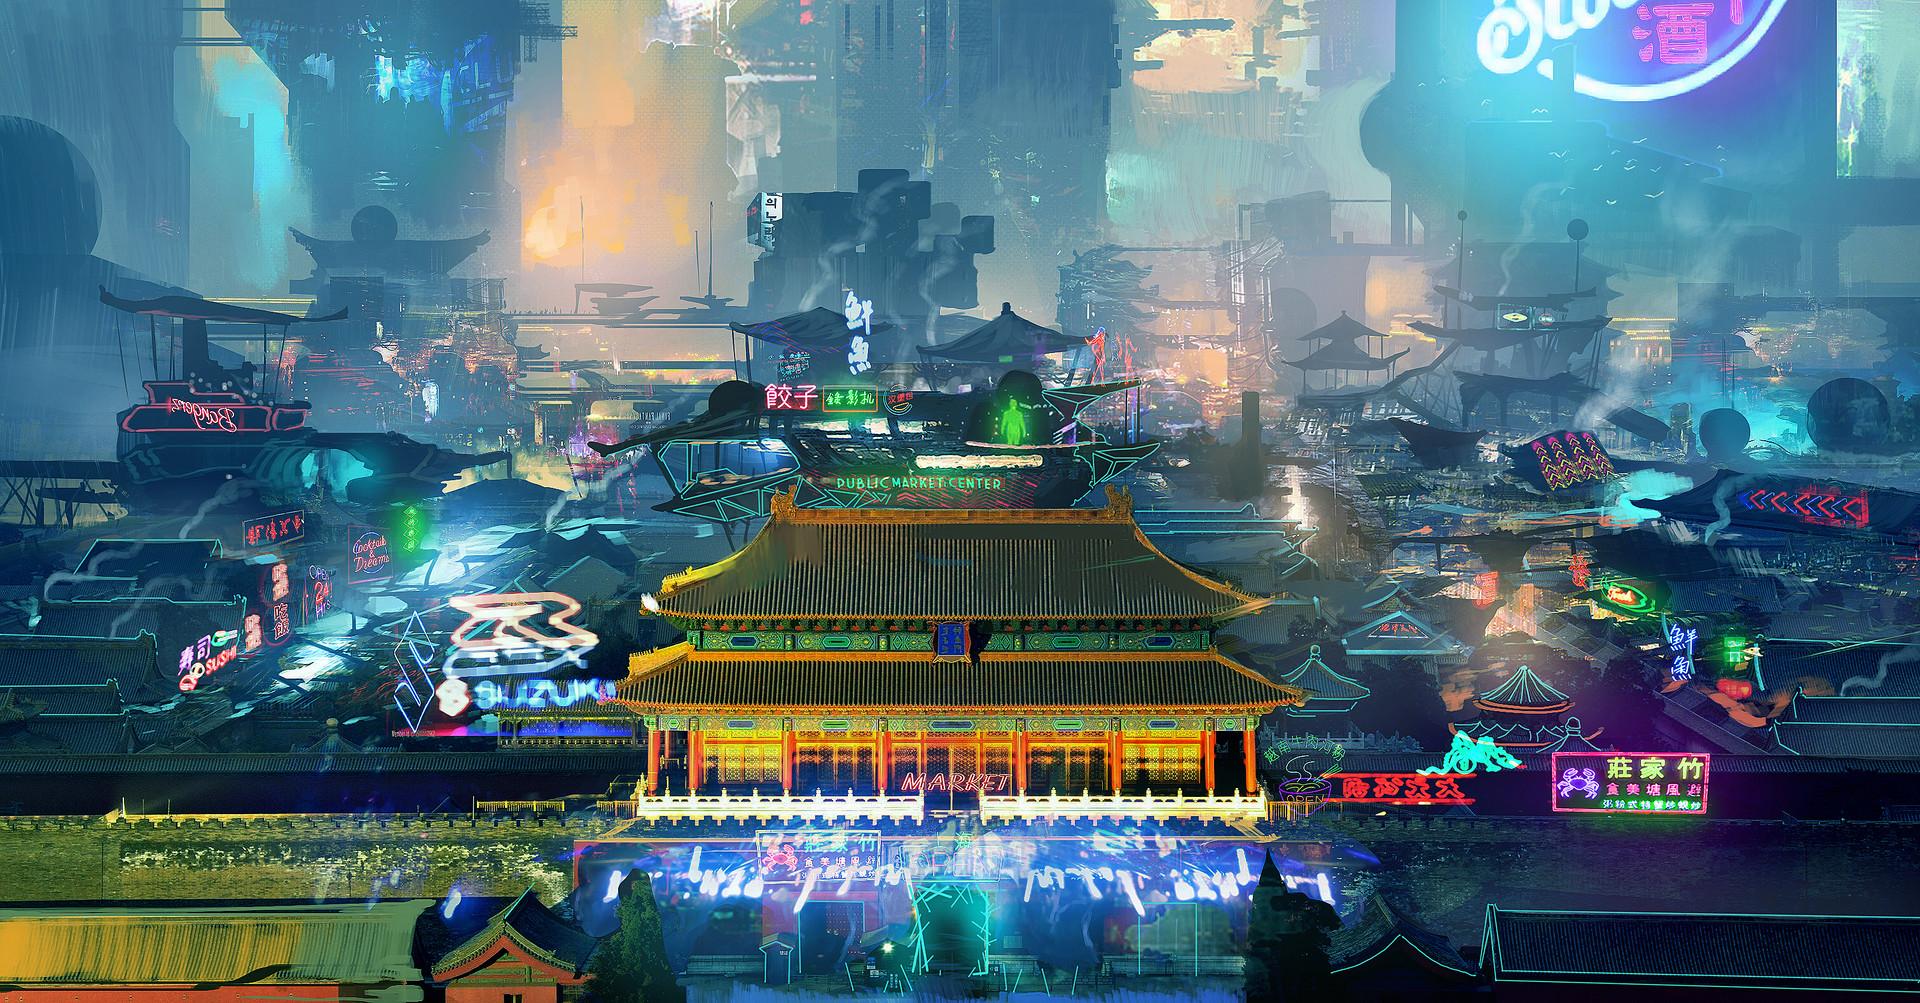 Samuel silverman forbidden city black market concept